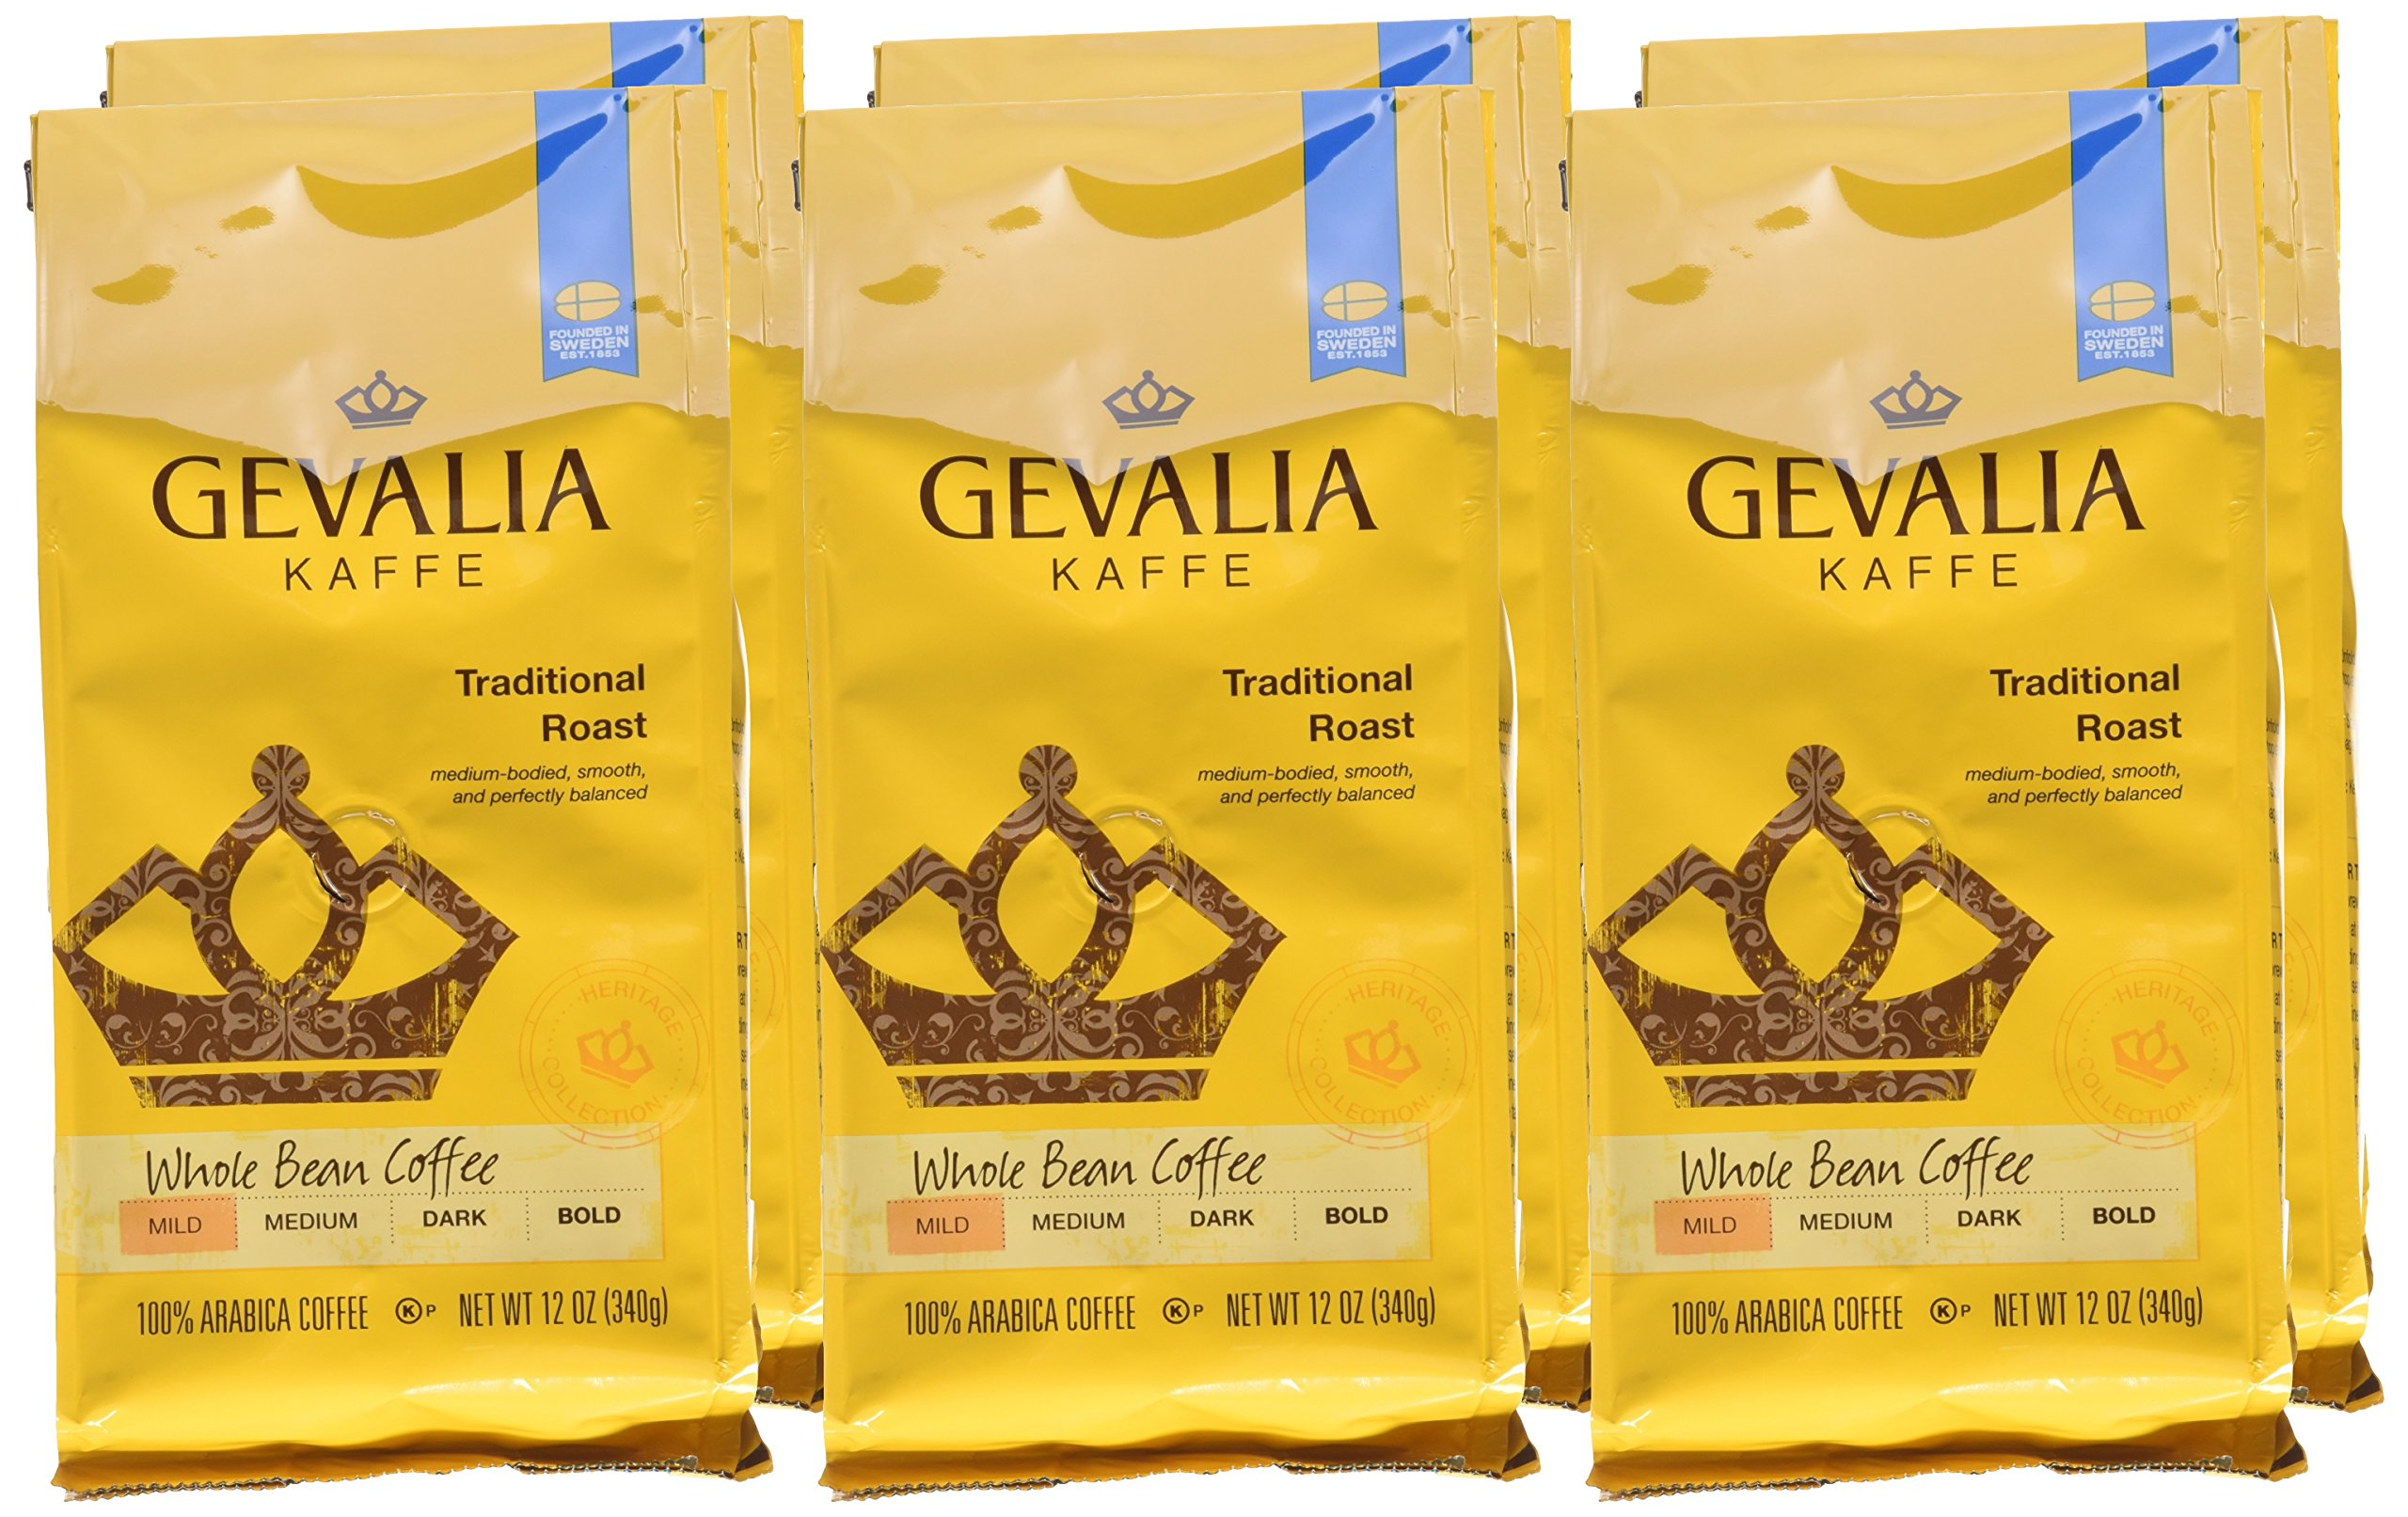 GEVALIA Traditional Roast Coffee, Mild, Whole Bean, 12 Ounce, 6 Pack by Gevalia (Image #2)